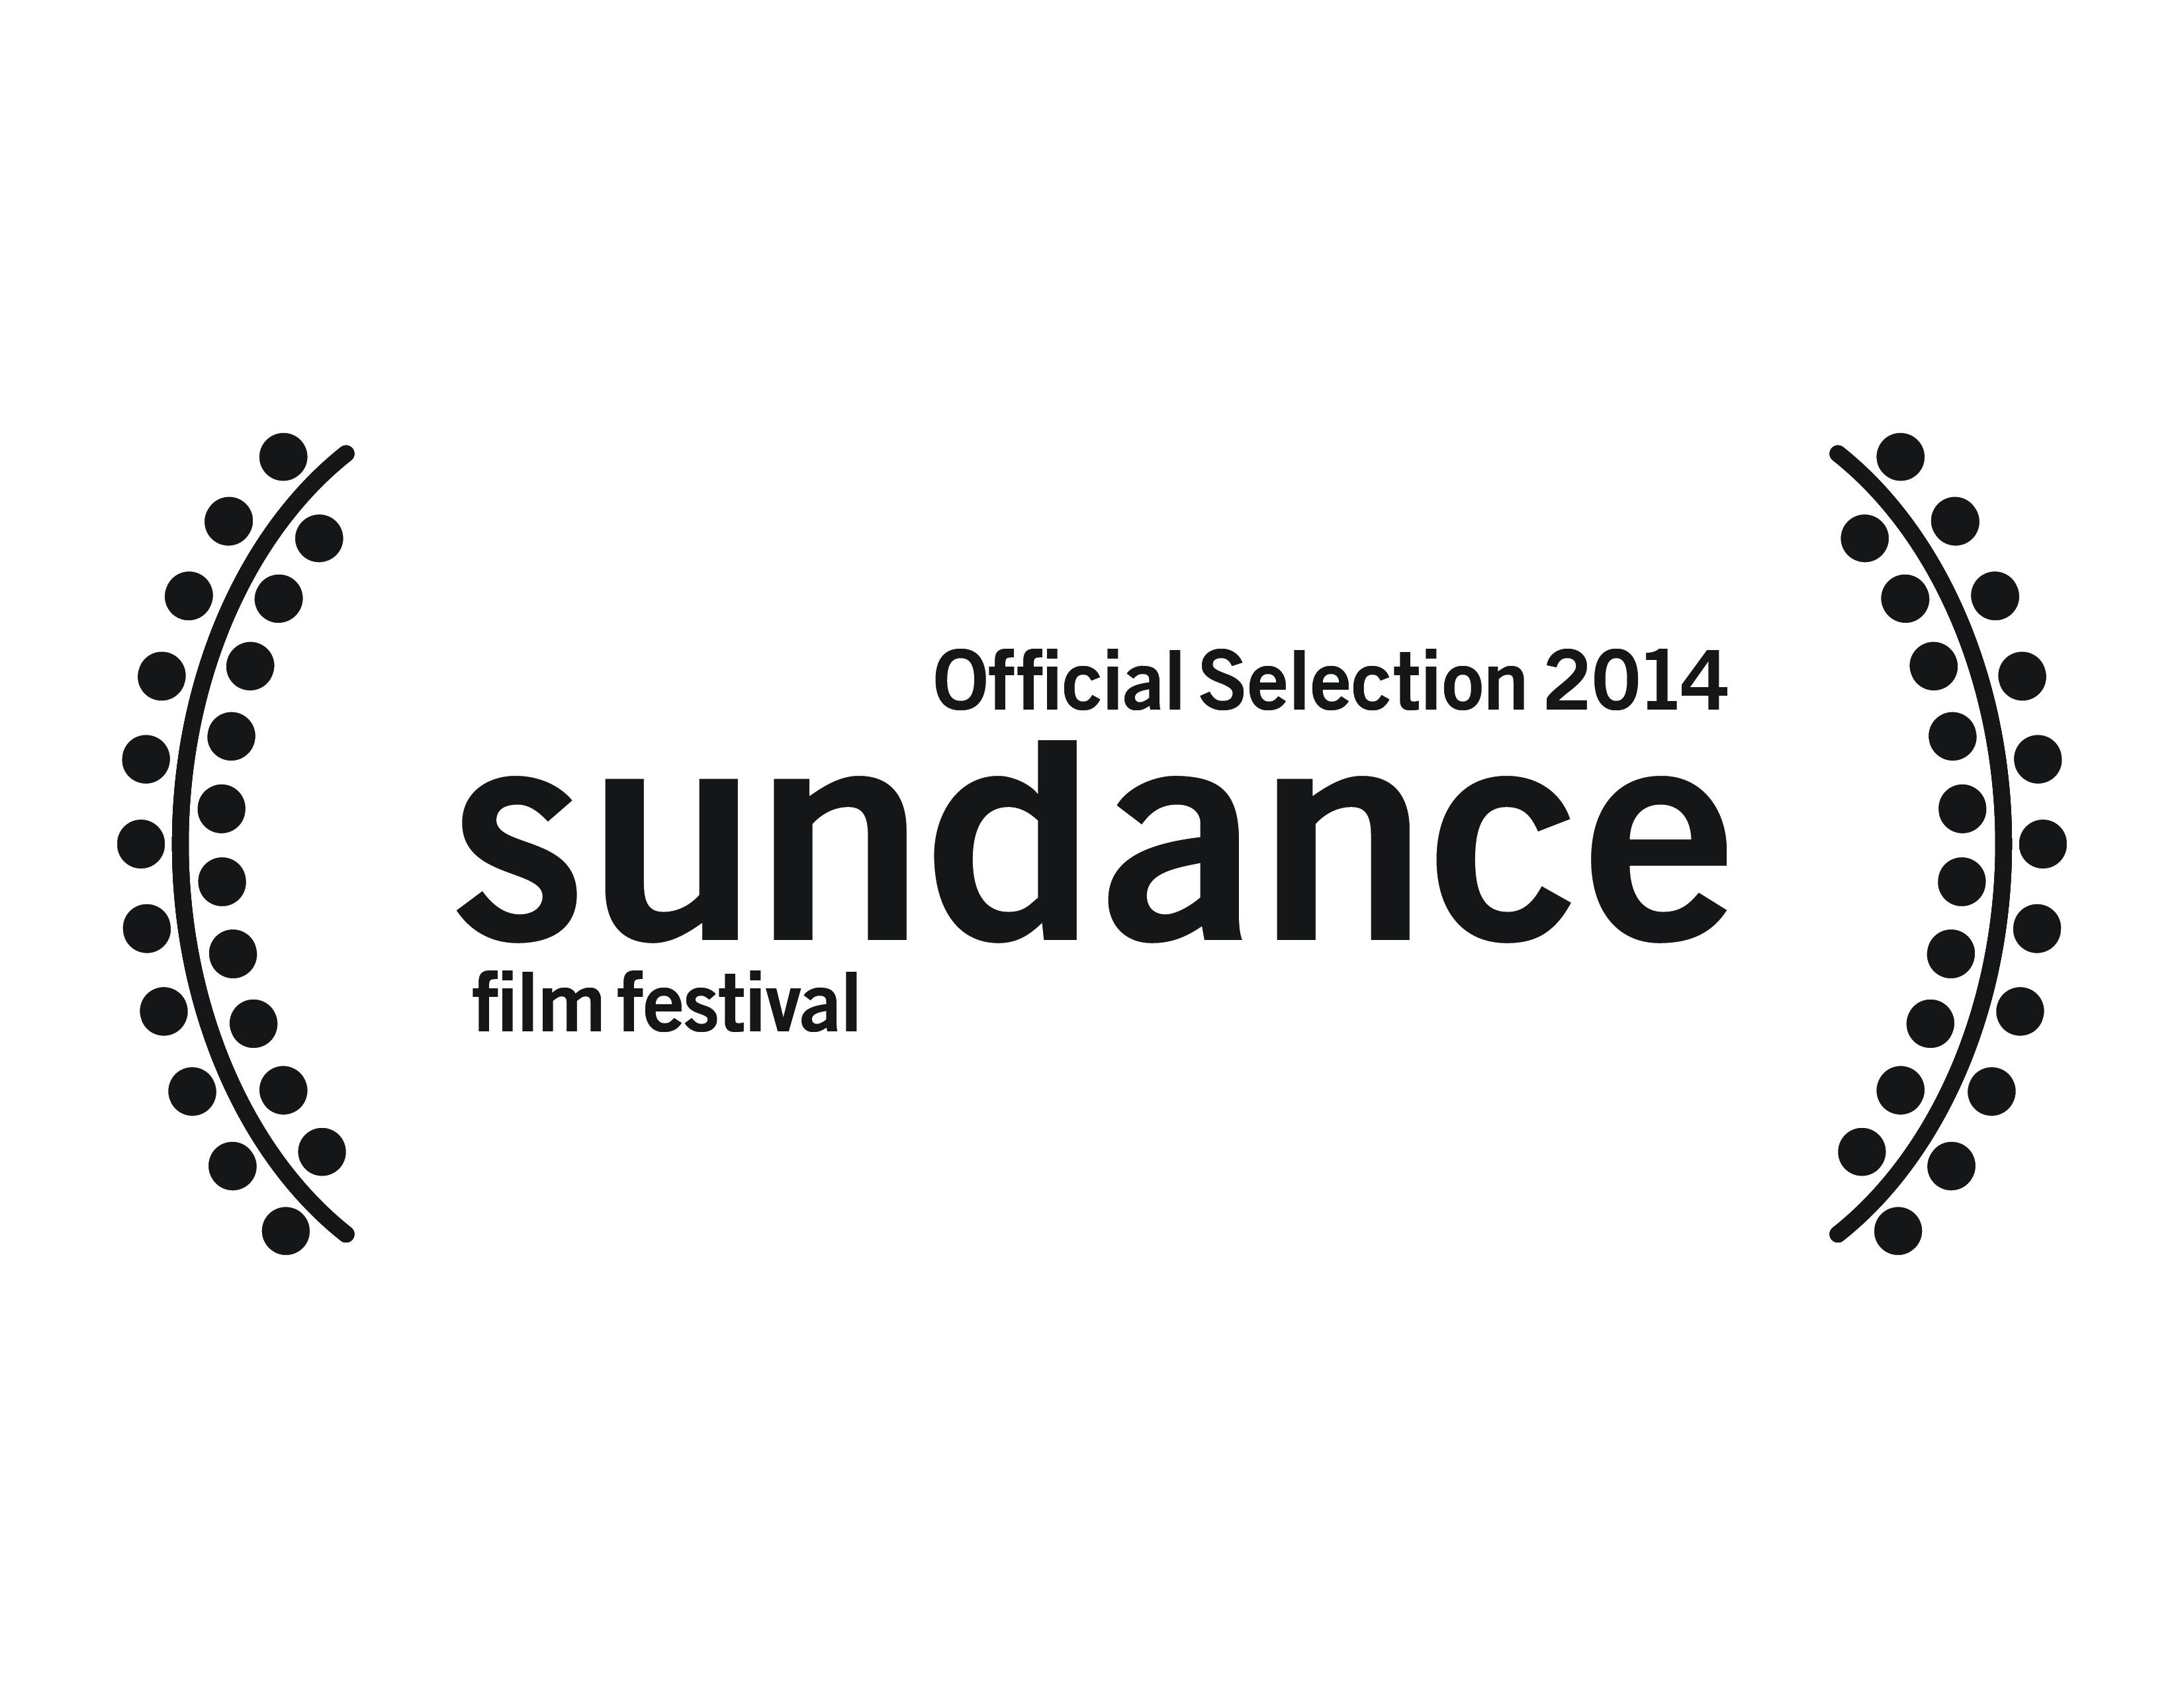 OC SundanceOfficialSelection2014LaurelBlack